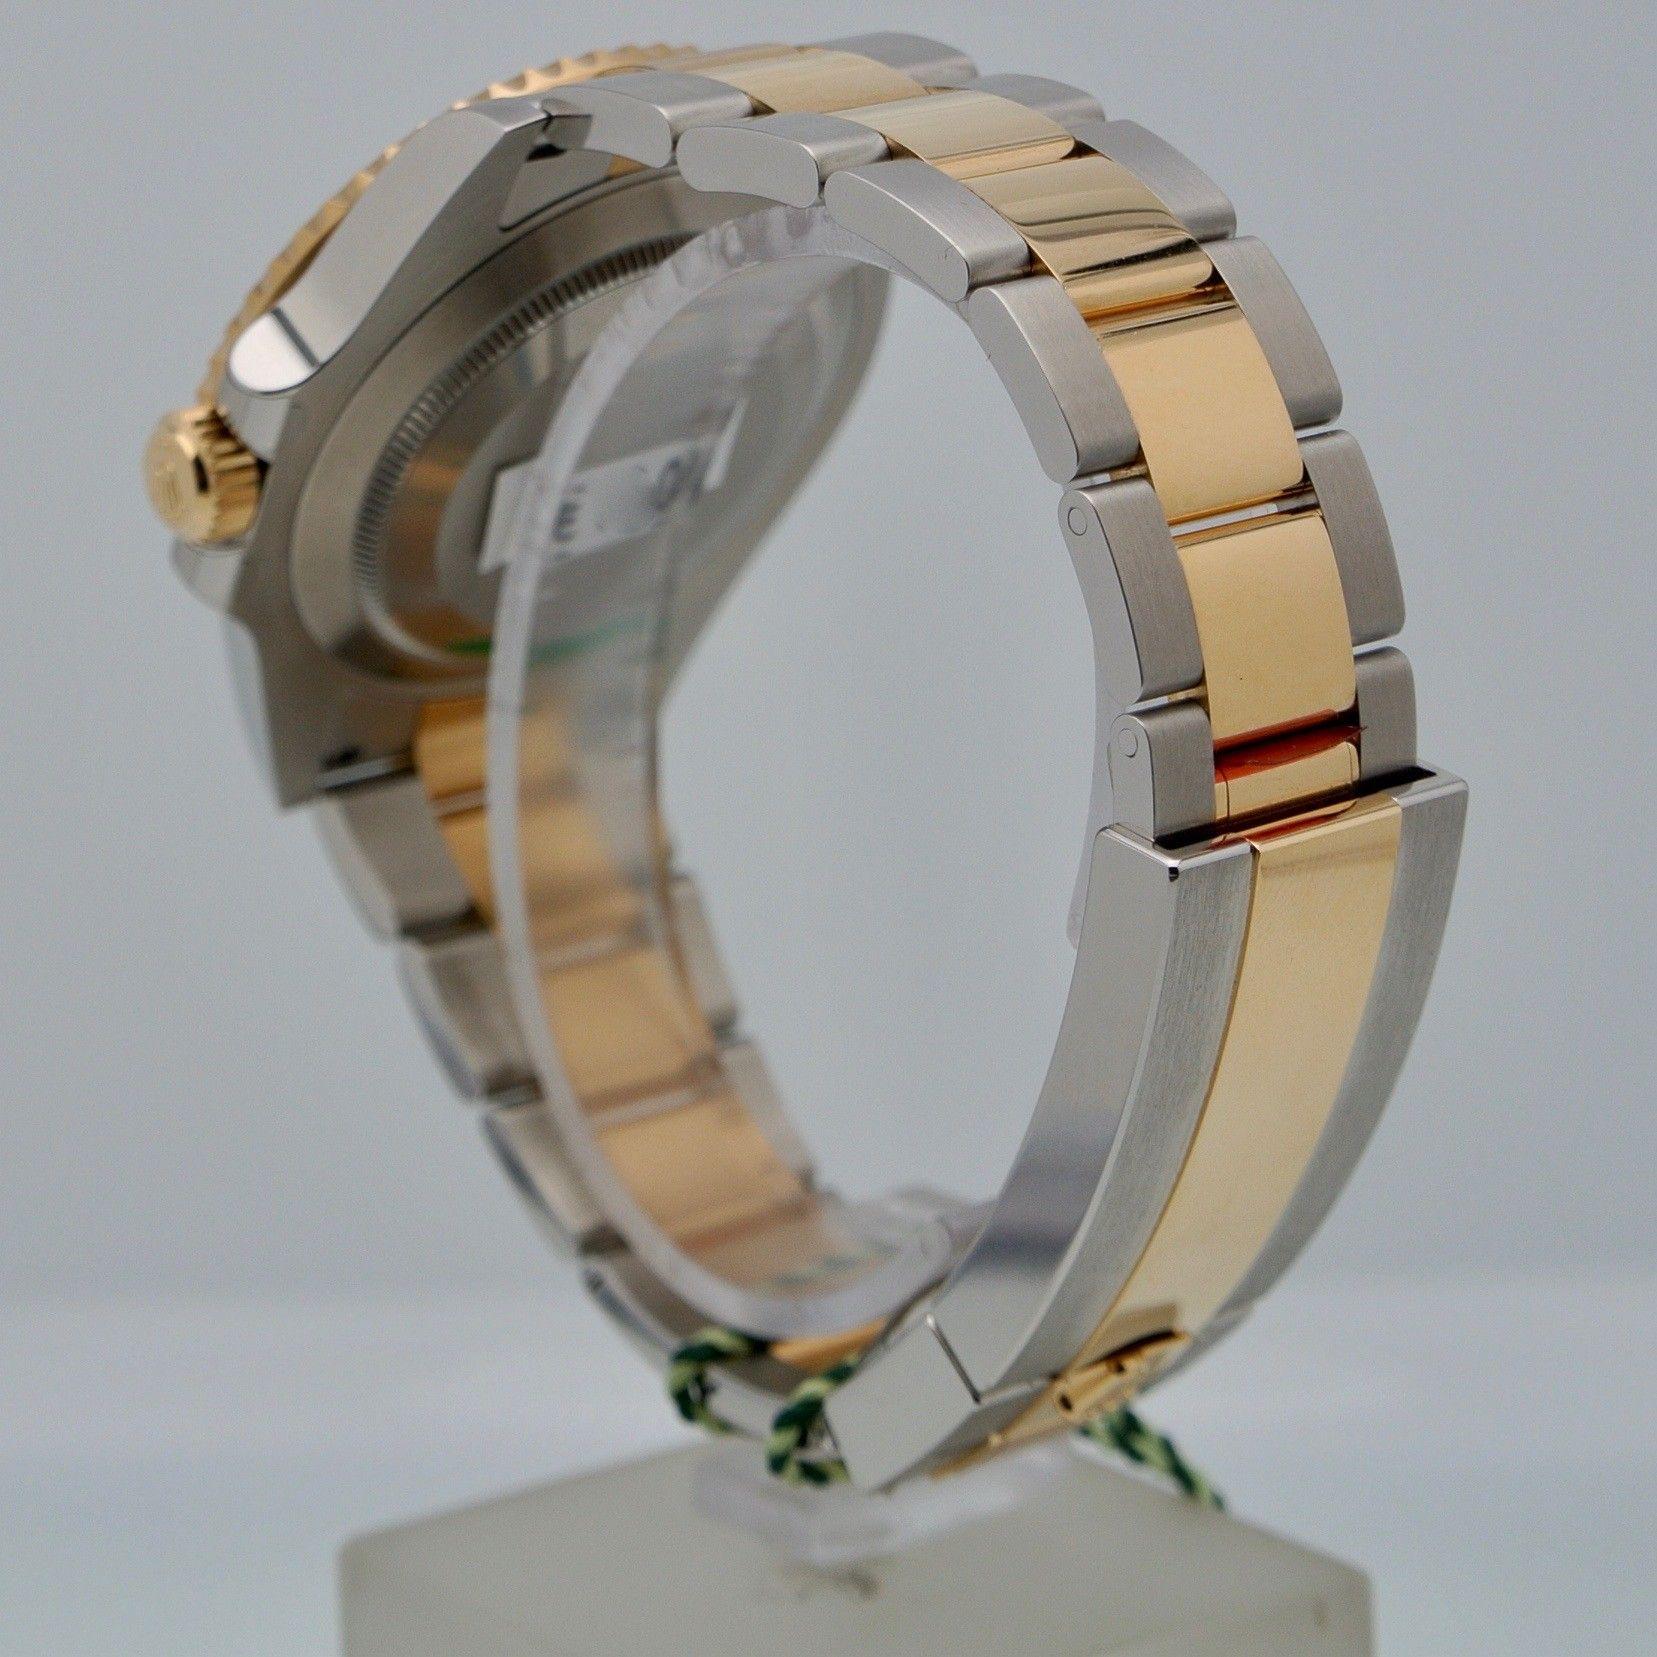 Rolex Submariner Date 41 steel/gold black dial